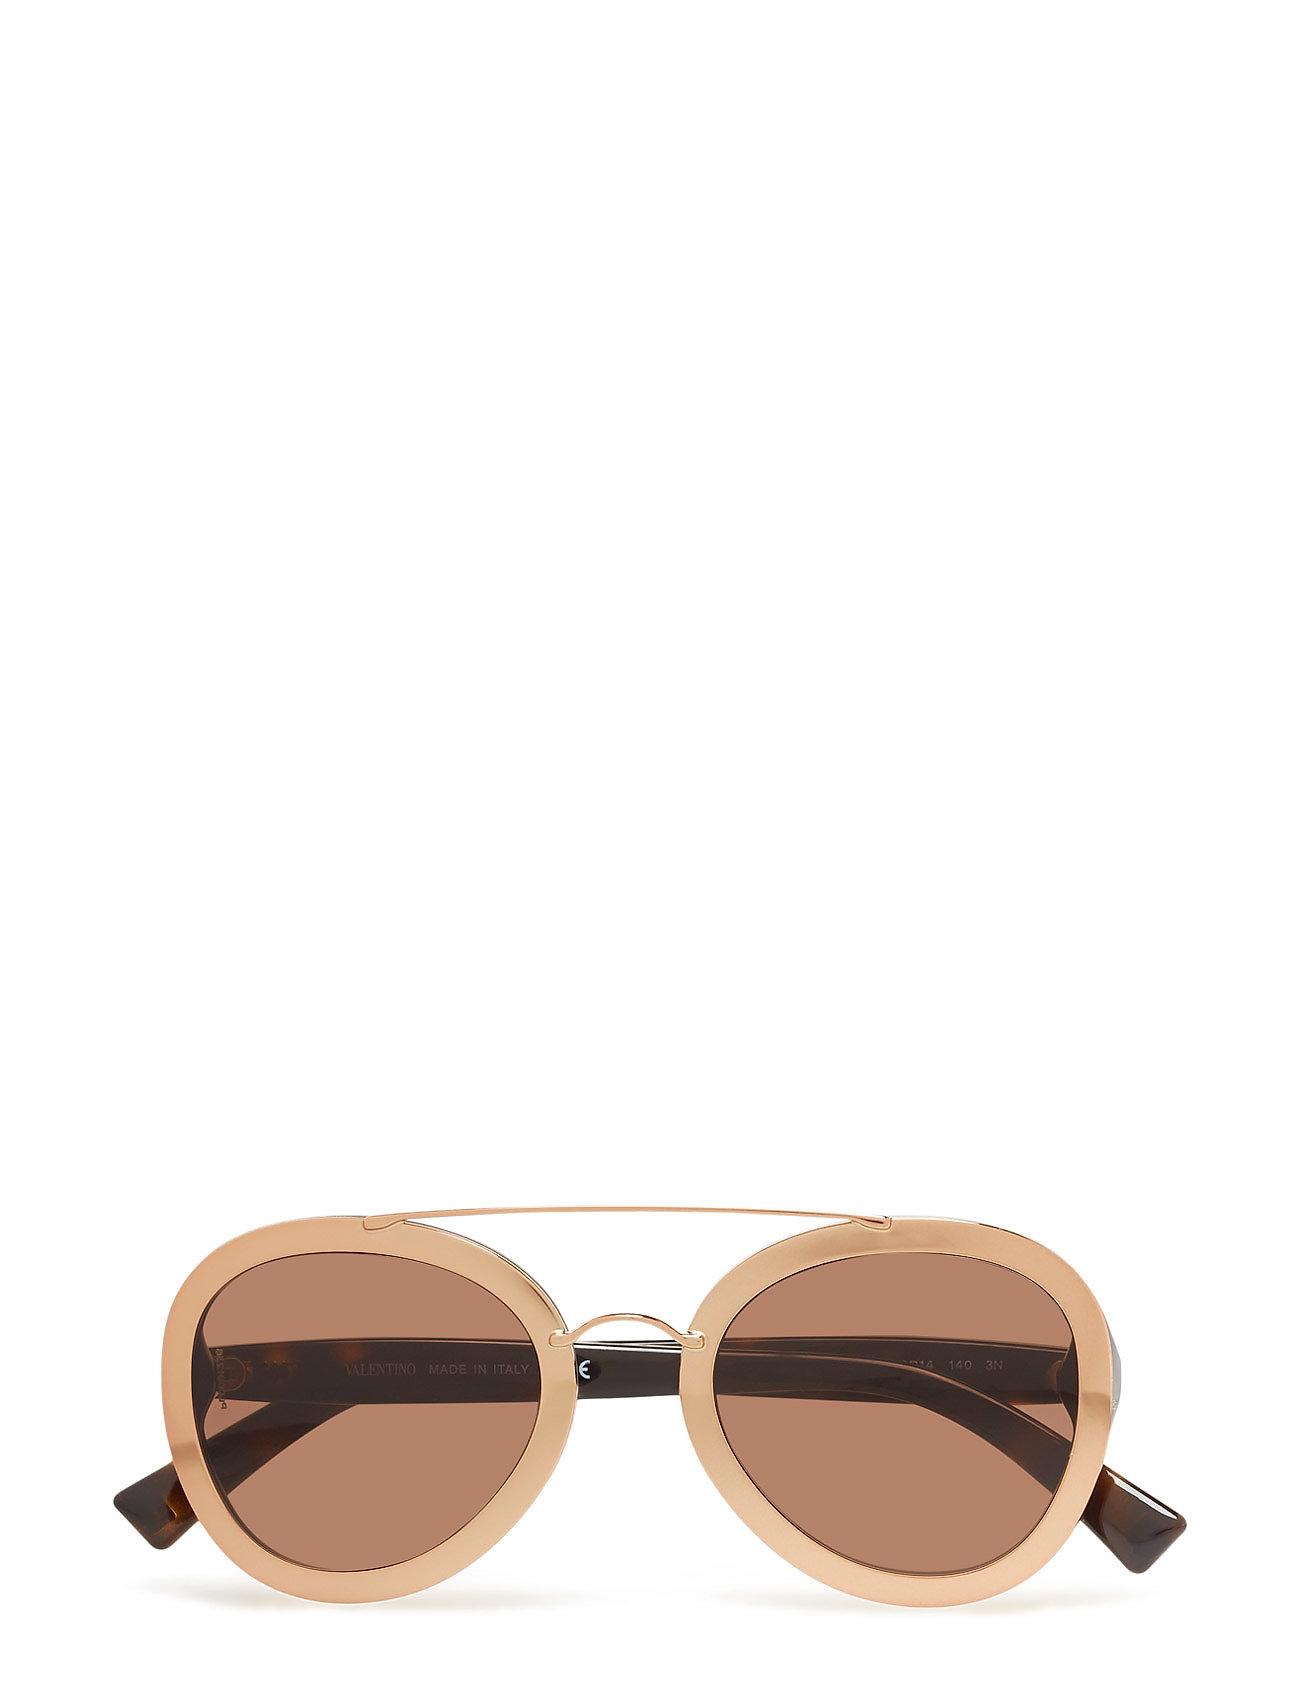 Rocker - Valentino Sunglasses